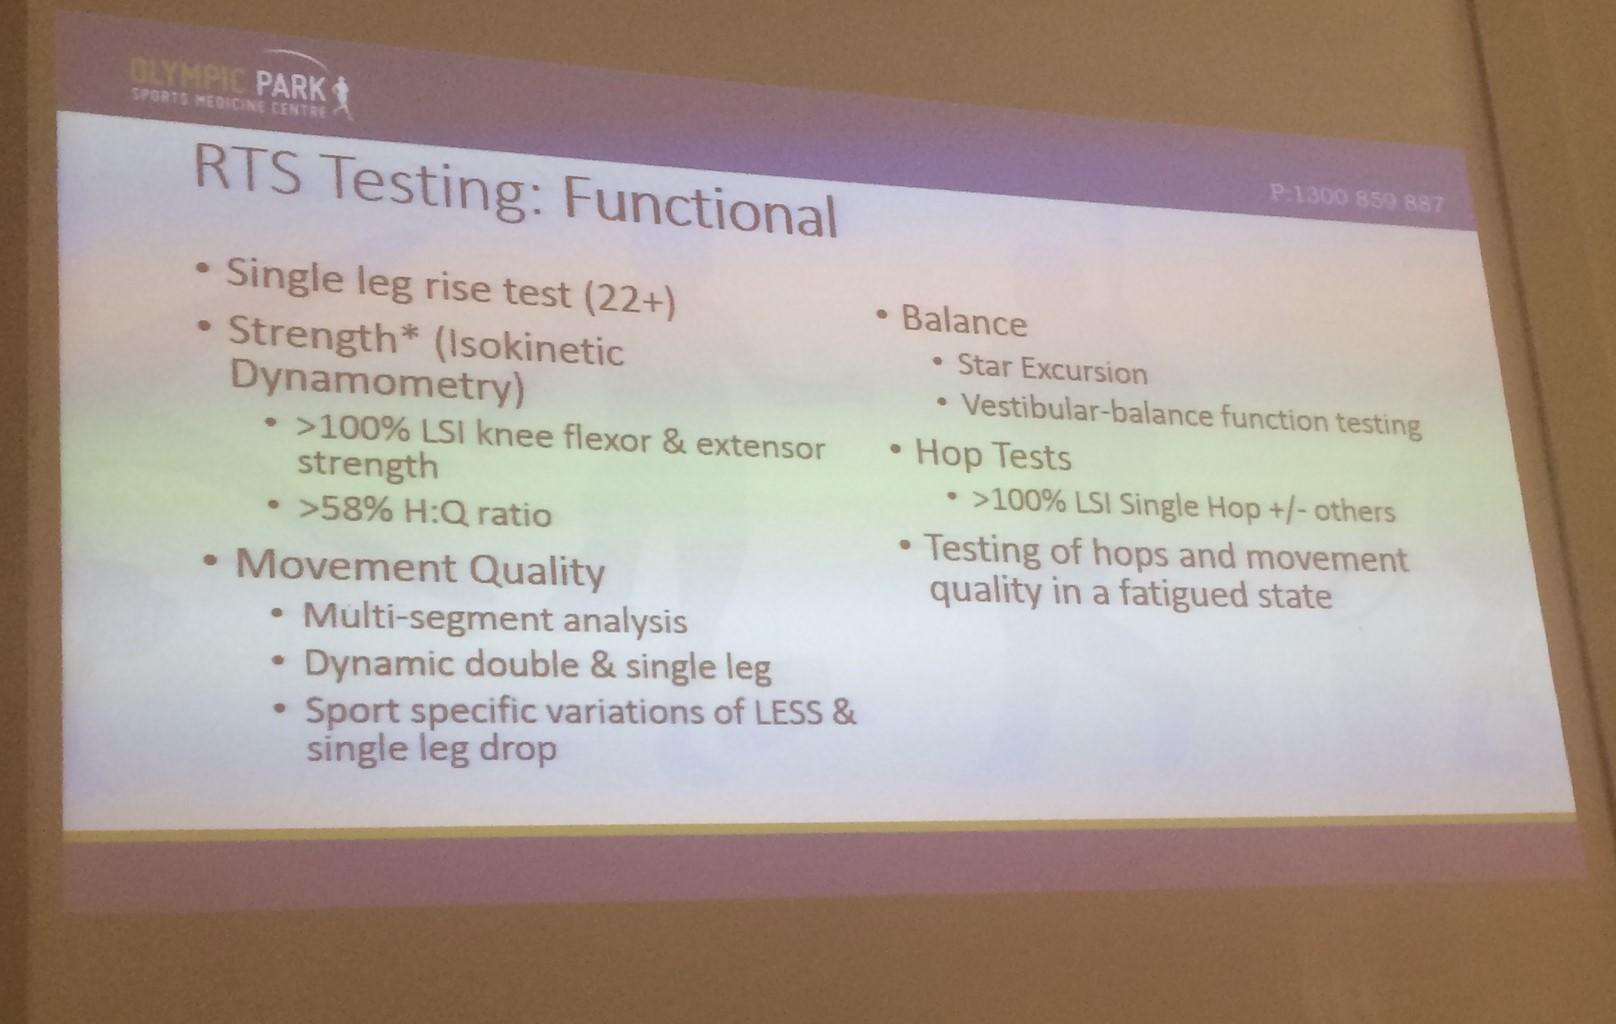 RTS Testing